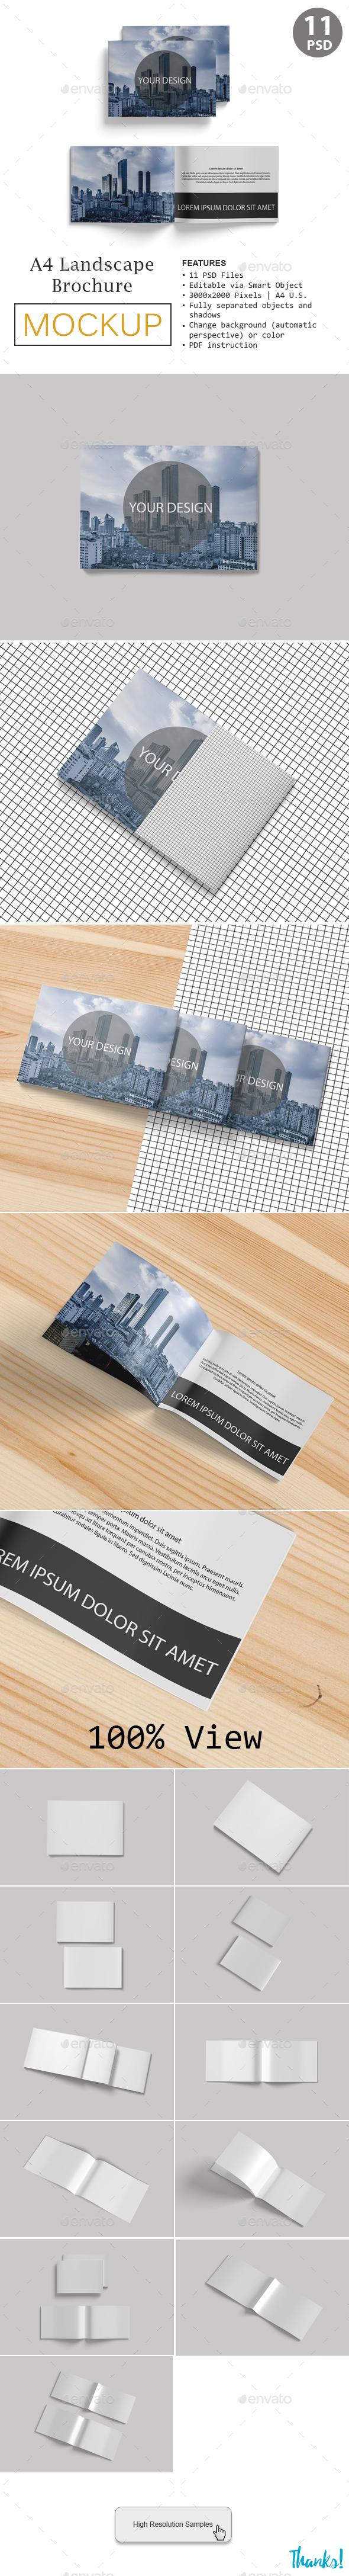 A4 Landscape Brocure Mockup - Product Mock-Ups Graphics